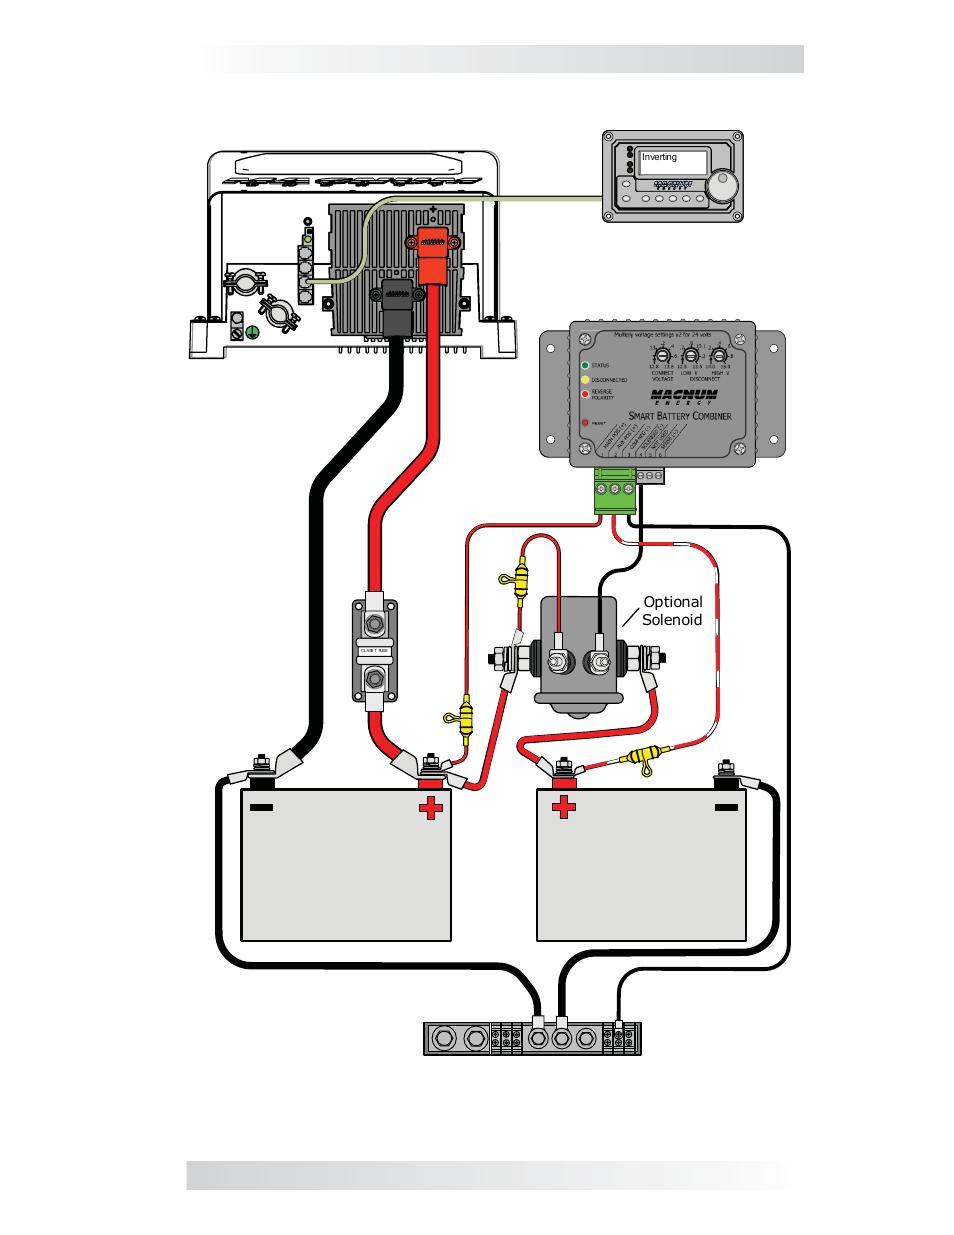 Installation, Figure 2-6, solenoid drive, O n /o f f   Magnum Energy on pump float diagram, 24 volts inverter diagram, rv charger wire diagram, sine wave ups circuit diagram, 2000w inverter wiring diagram, boat inverter wiring diagram, inverter remote control wiring diagram, solar power schematic diagram, 3000w inverter wiring diagram, how aquaponics works diagram, inverter charger installation, power inverter diagram, inverter charger capacitor, inverter charger generator, solar inverter wiring diagram, inverter system diagram, inverter circuit diagram, grid tie inverter wiring diagram, rv inverter wiring diagram, battery and inverter wiring diagram,